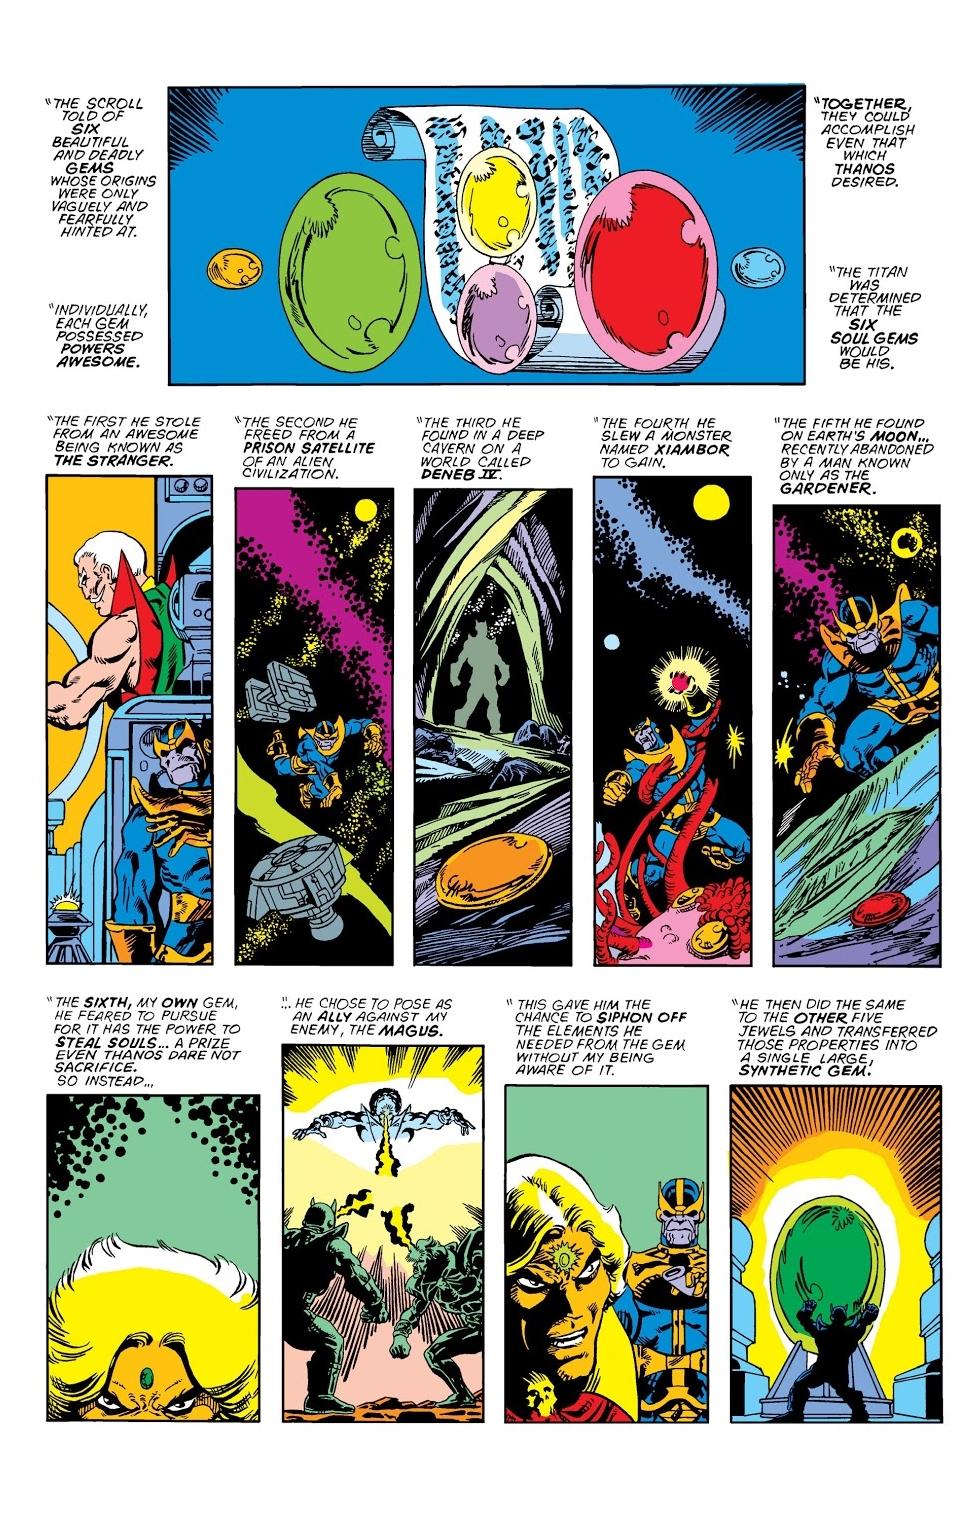 Diversions of the Groovy Kind: Thanos Week! Secret Origins ...